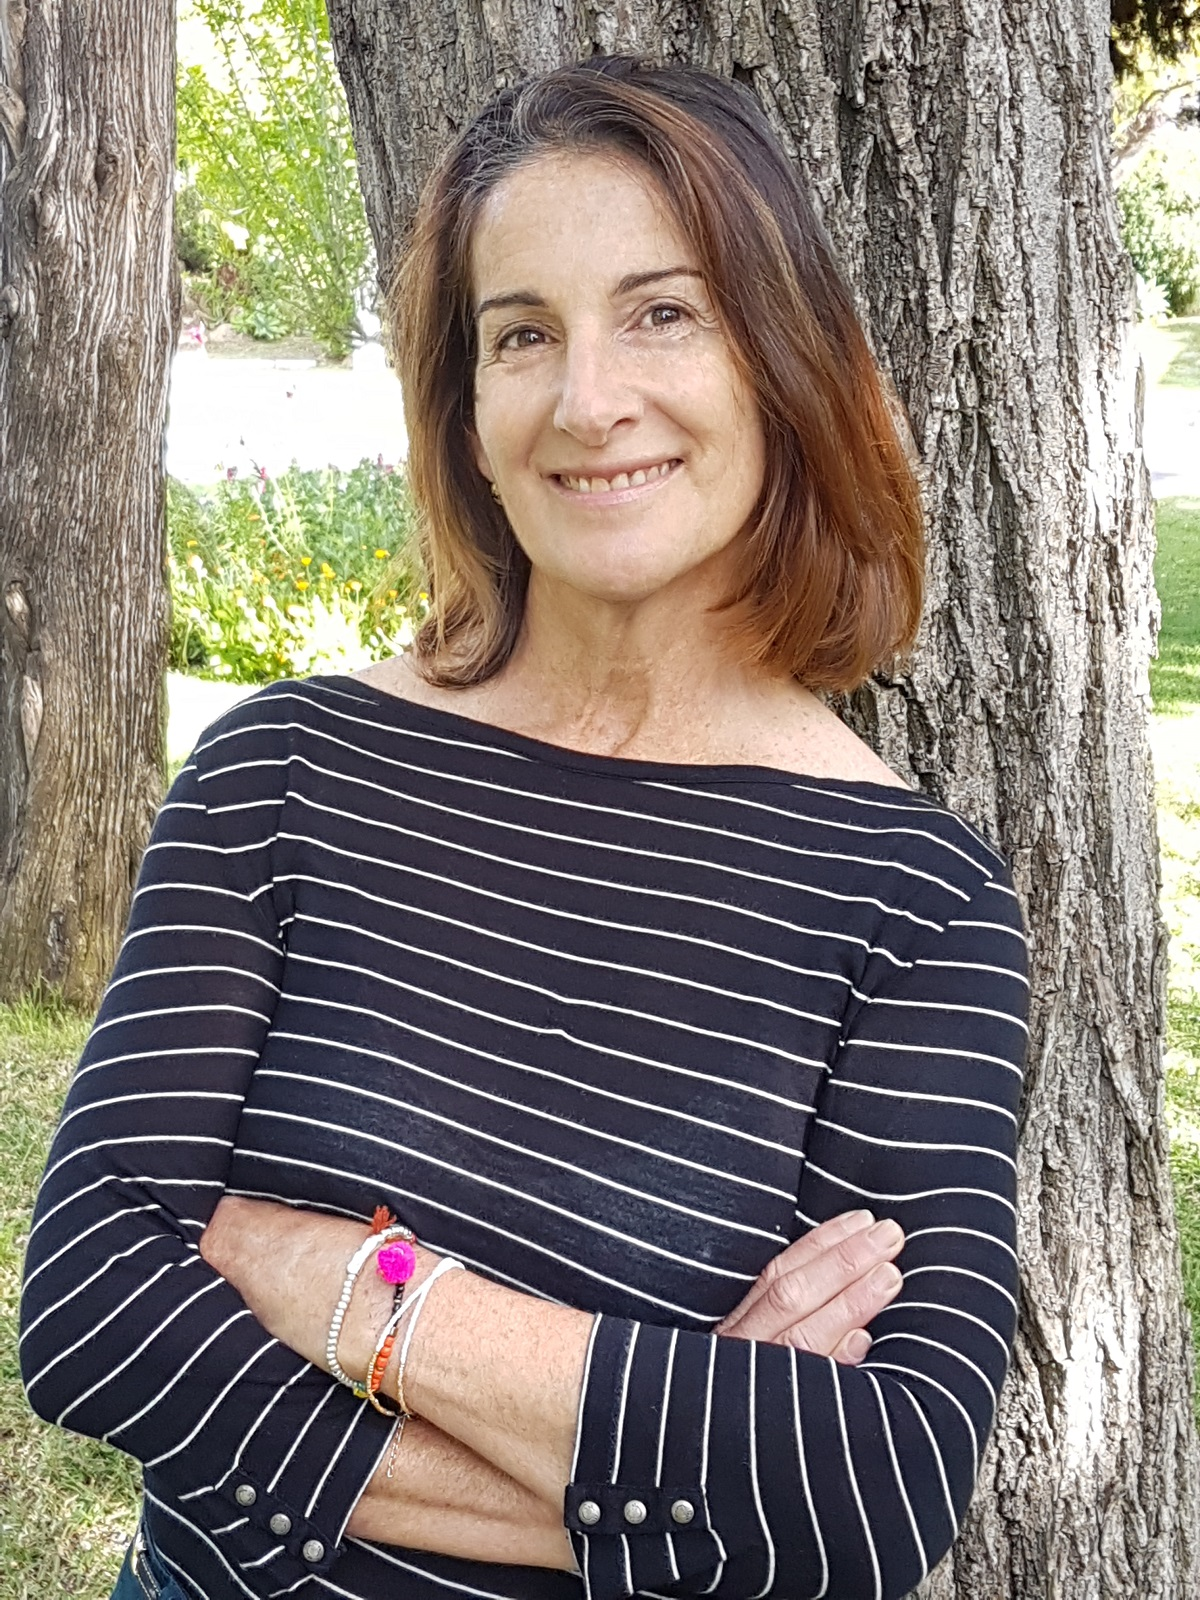 Mª José Fernandez Aleau